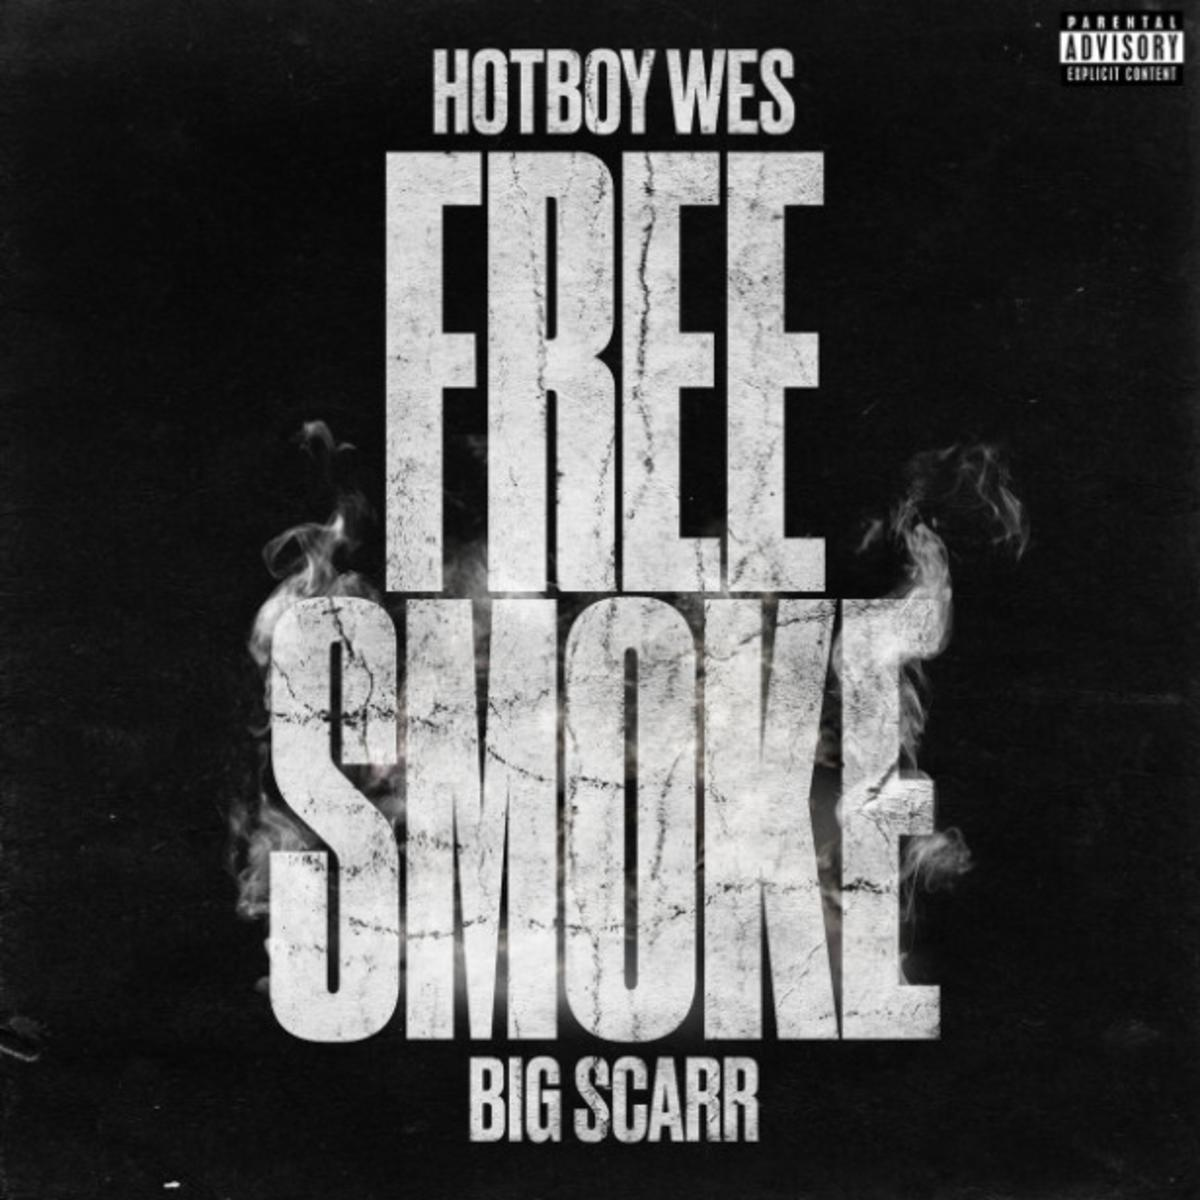 Hotboy Wes Ft. Big Scarr - Free Smoke Mp3